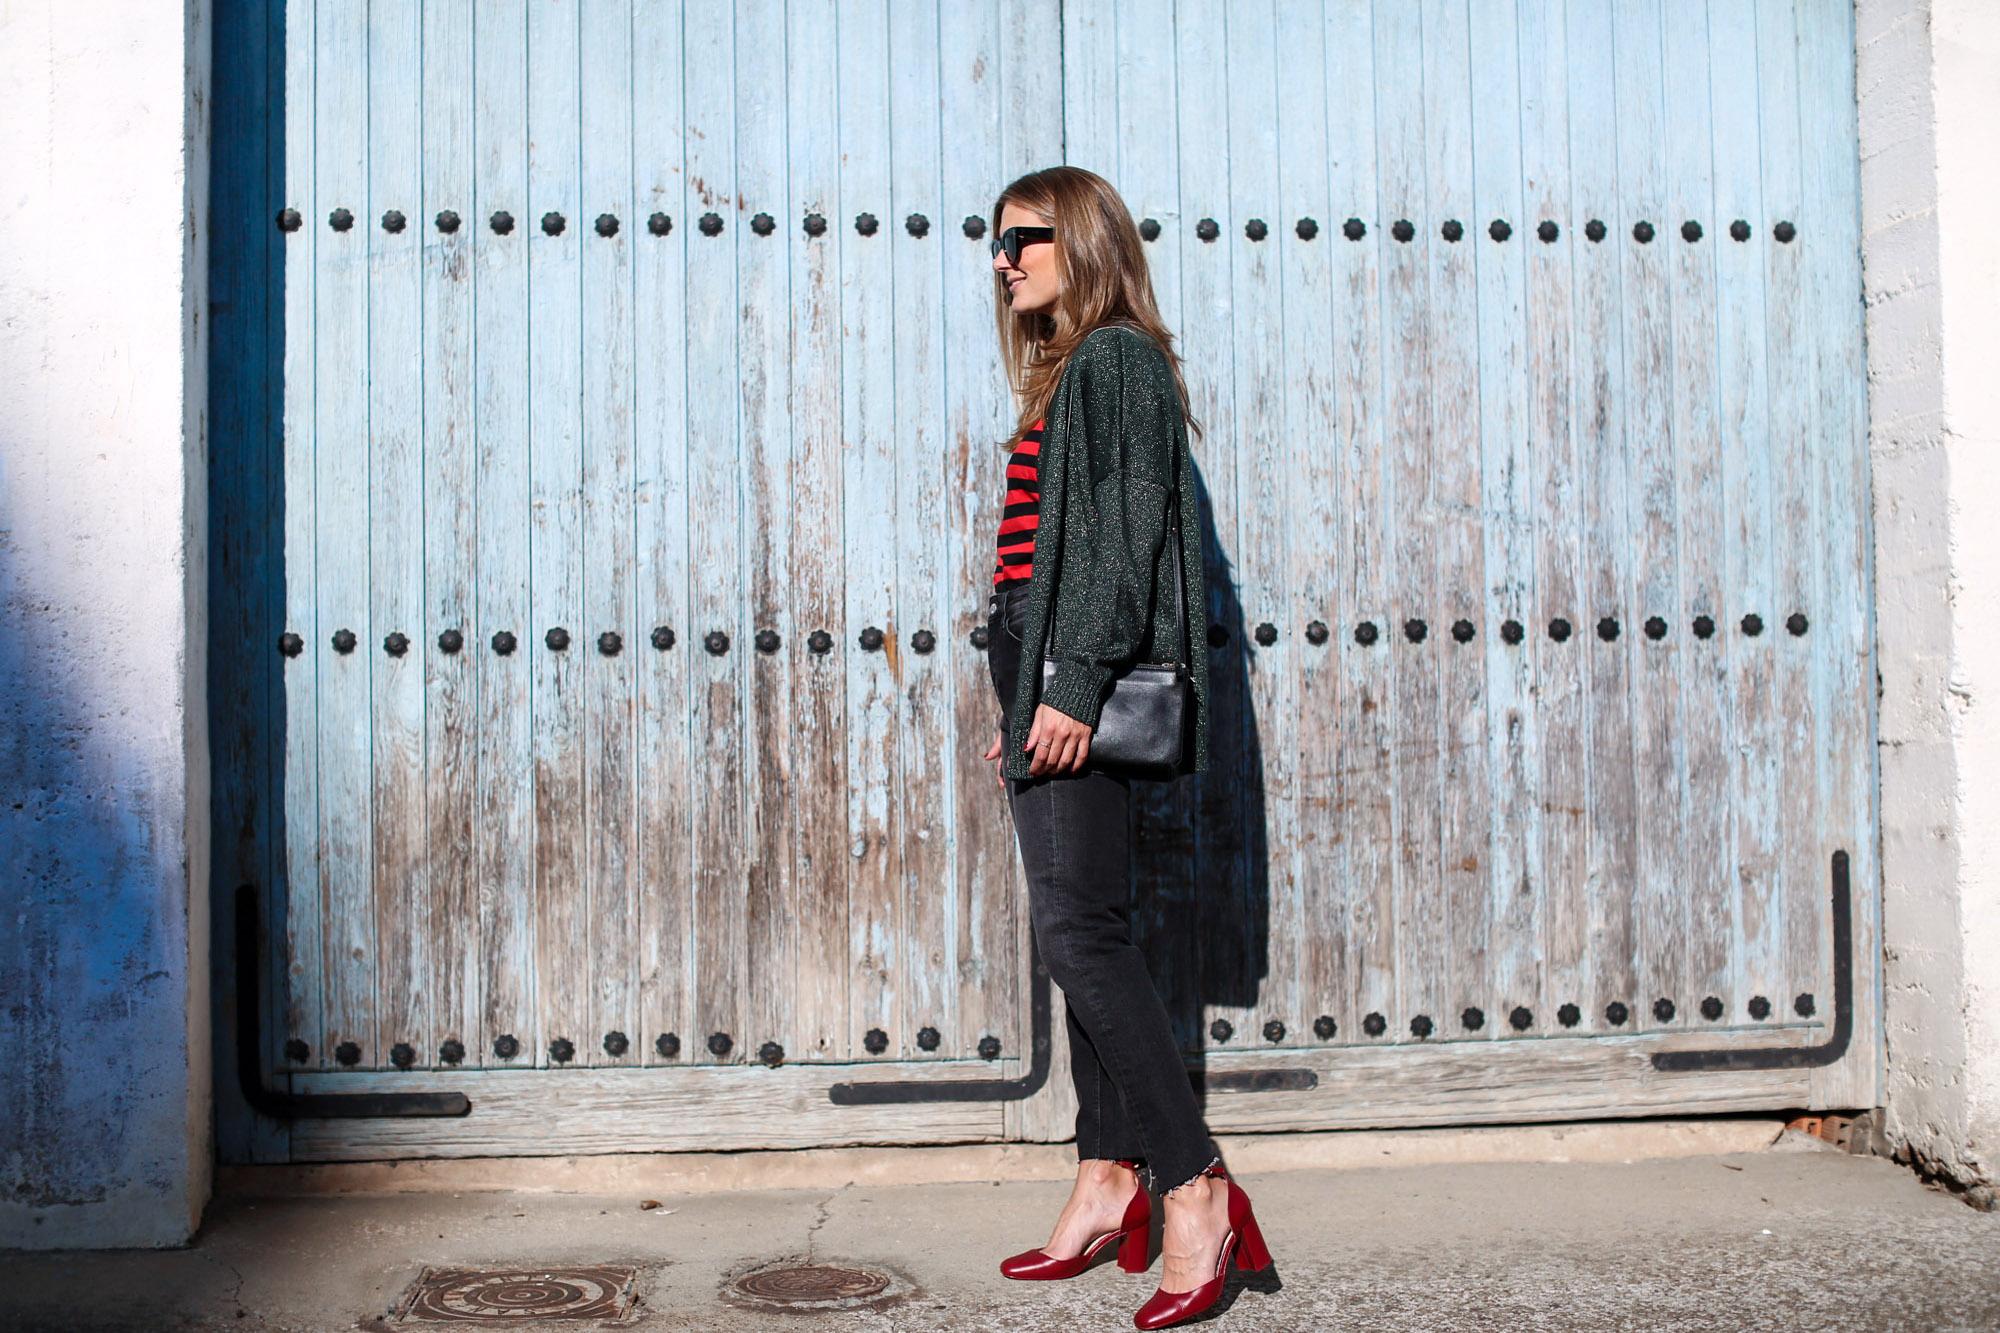 clochet_streetstyle_fashionblogger_zapatostaconrojospielzara_bolsotrioceline_momjeansh&m-4